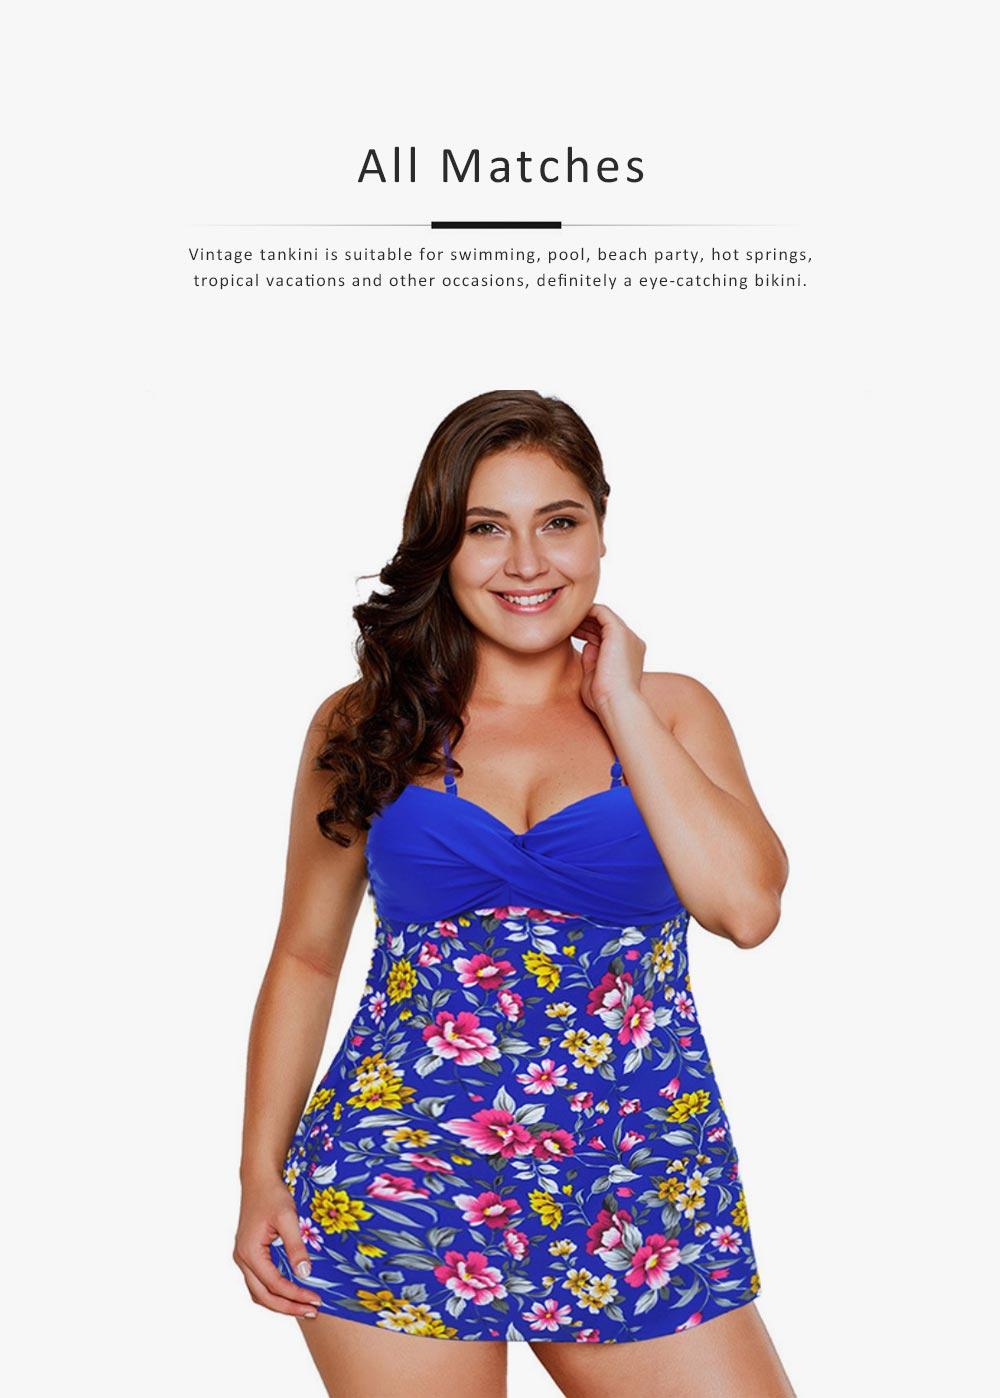 Women Floral Tankini Tummy Control Swimwear Tank Top Retro Printed Swimsuit with Boyshorts Two Piece Bathing Suit 5